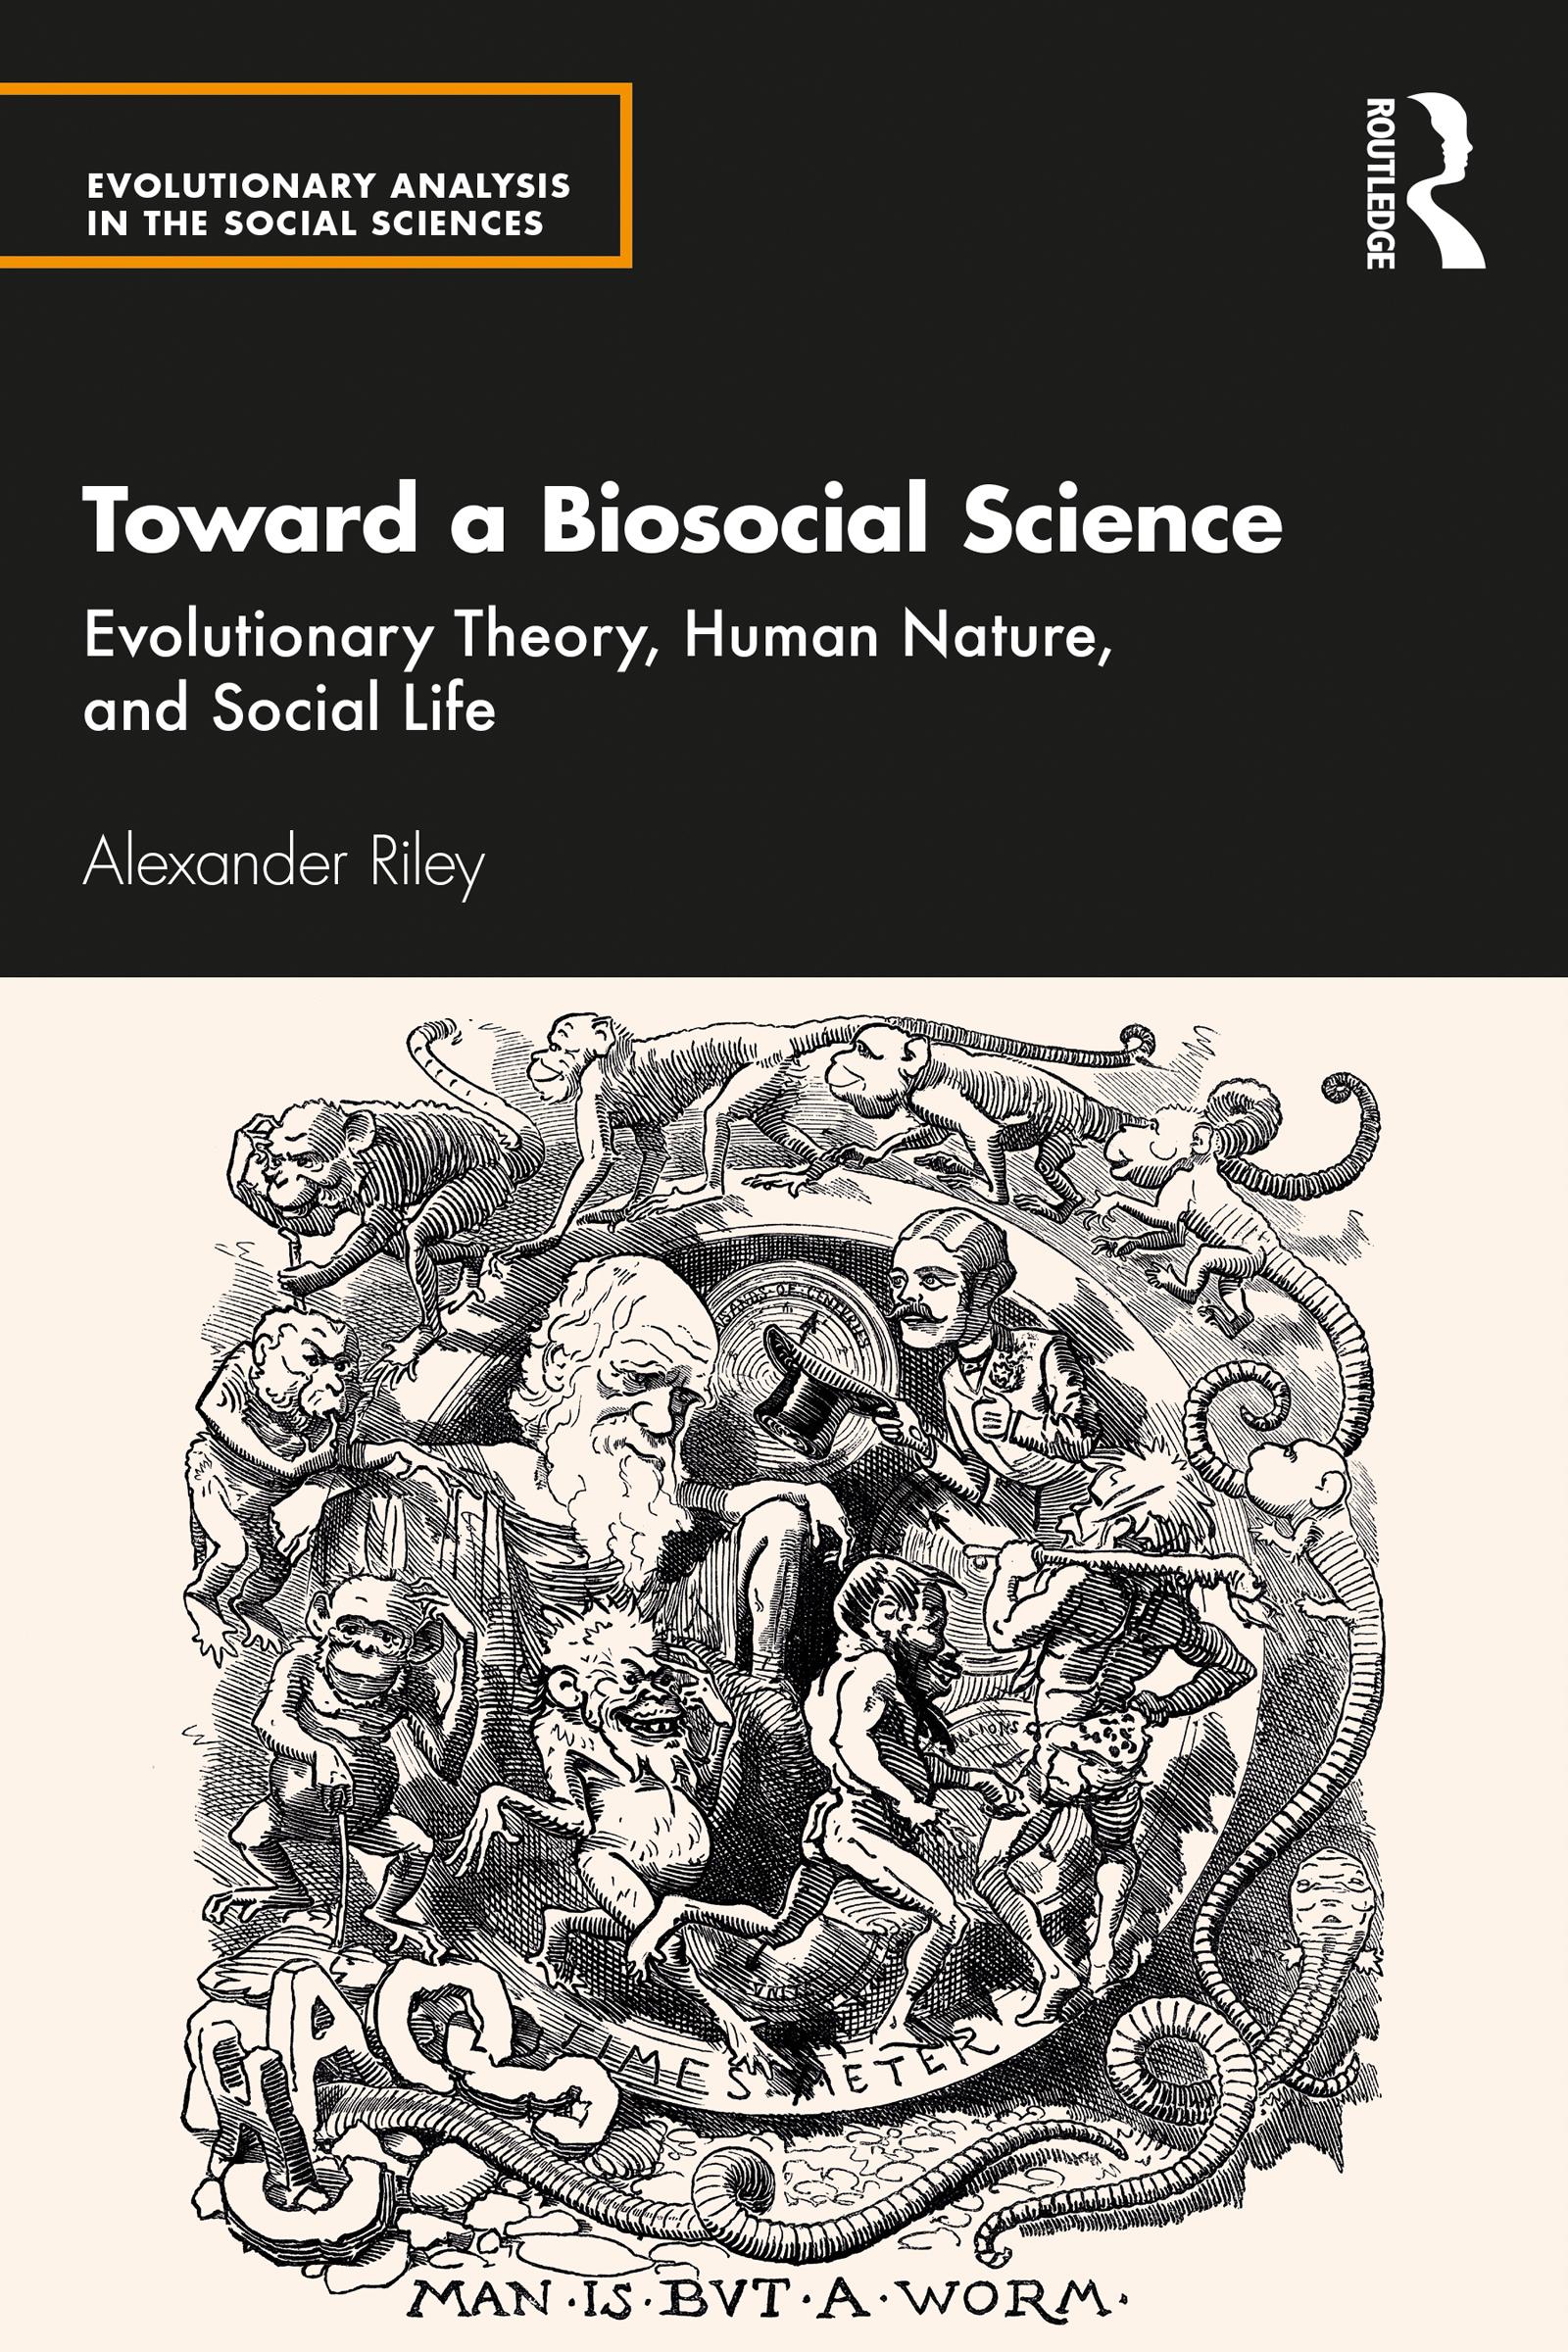 Morality in a Biosocial Context